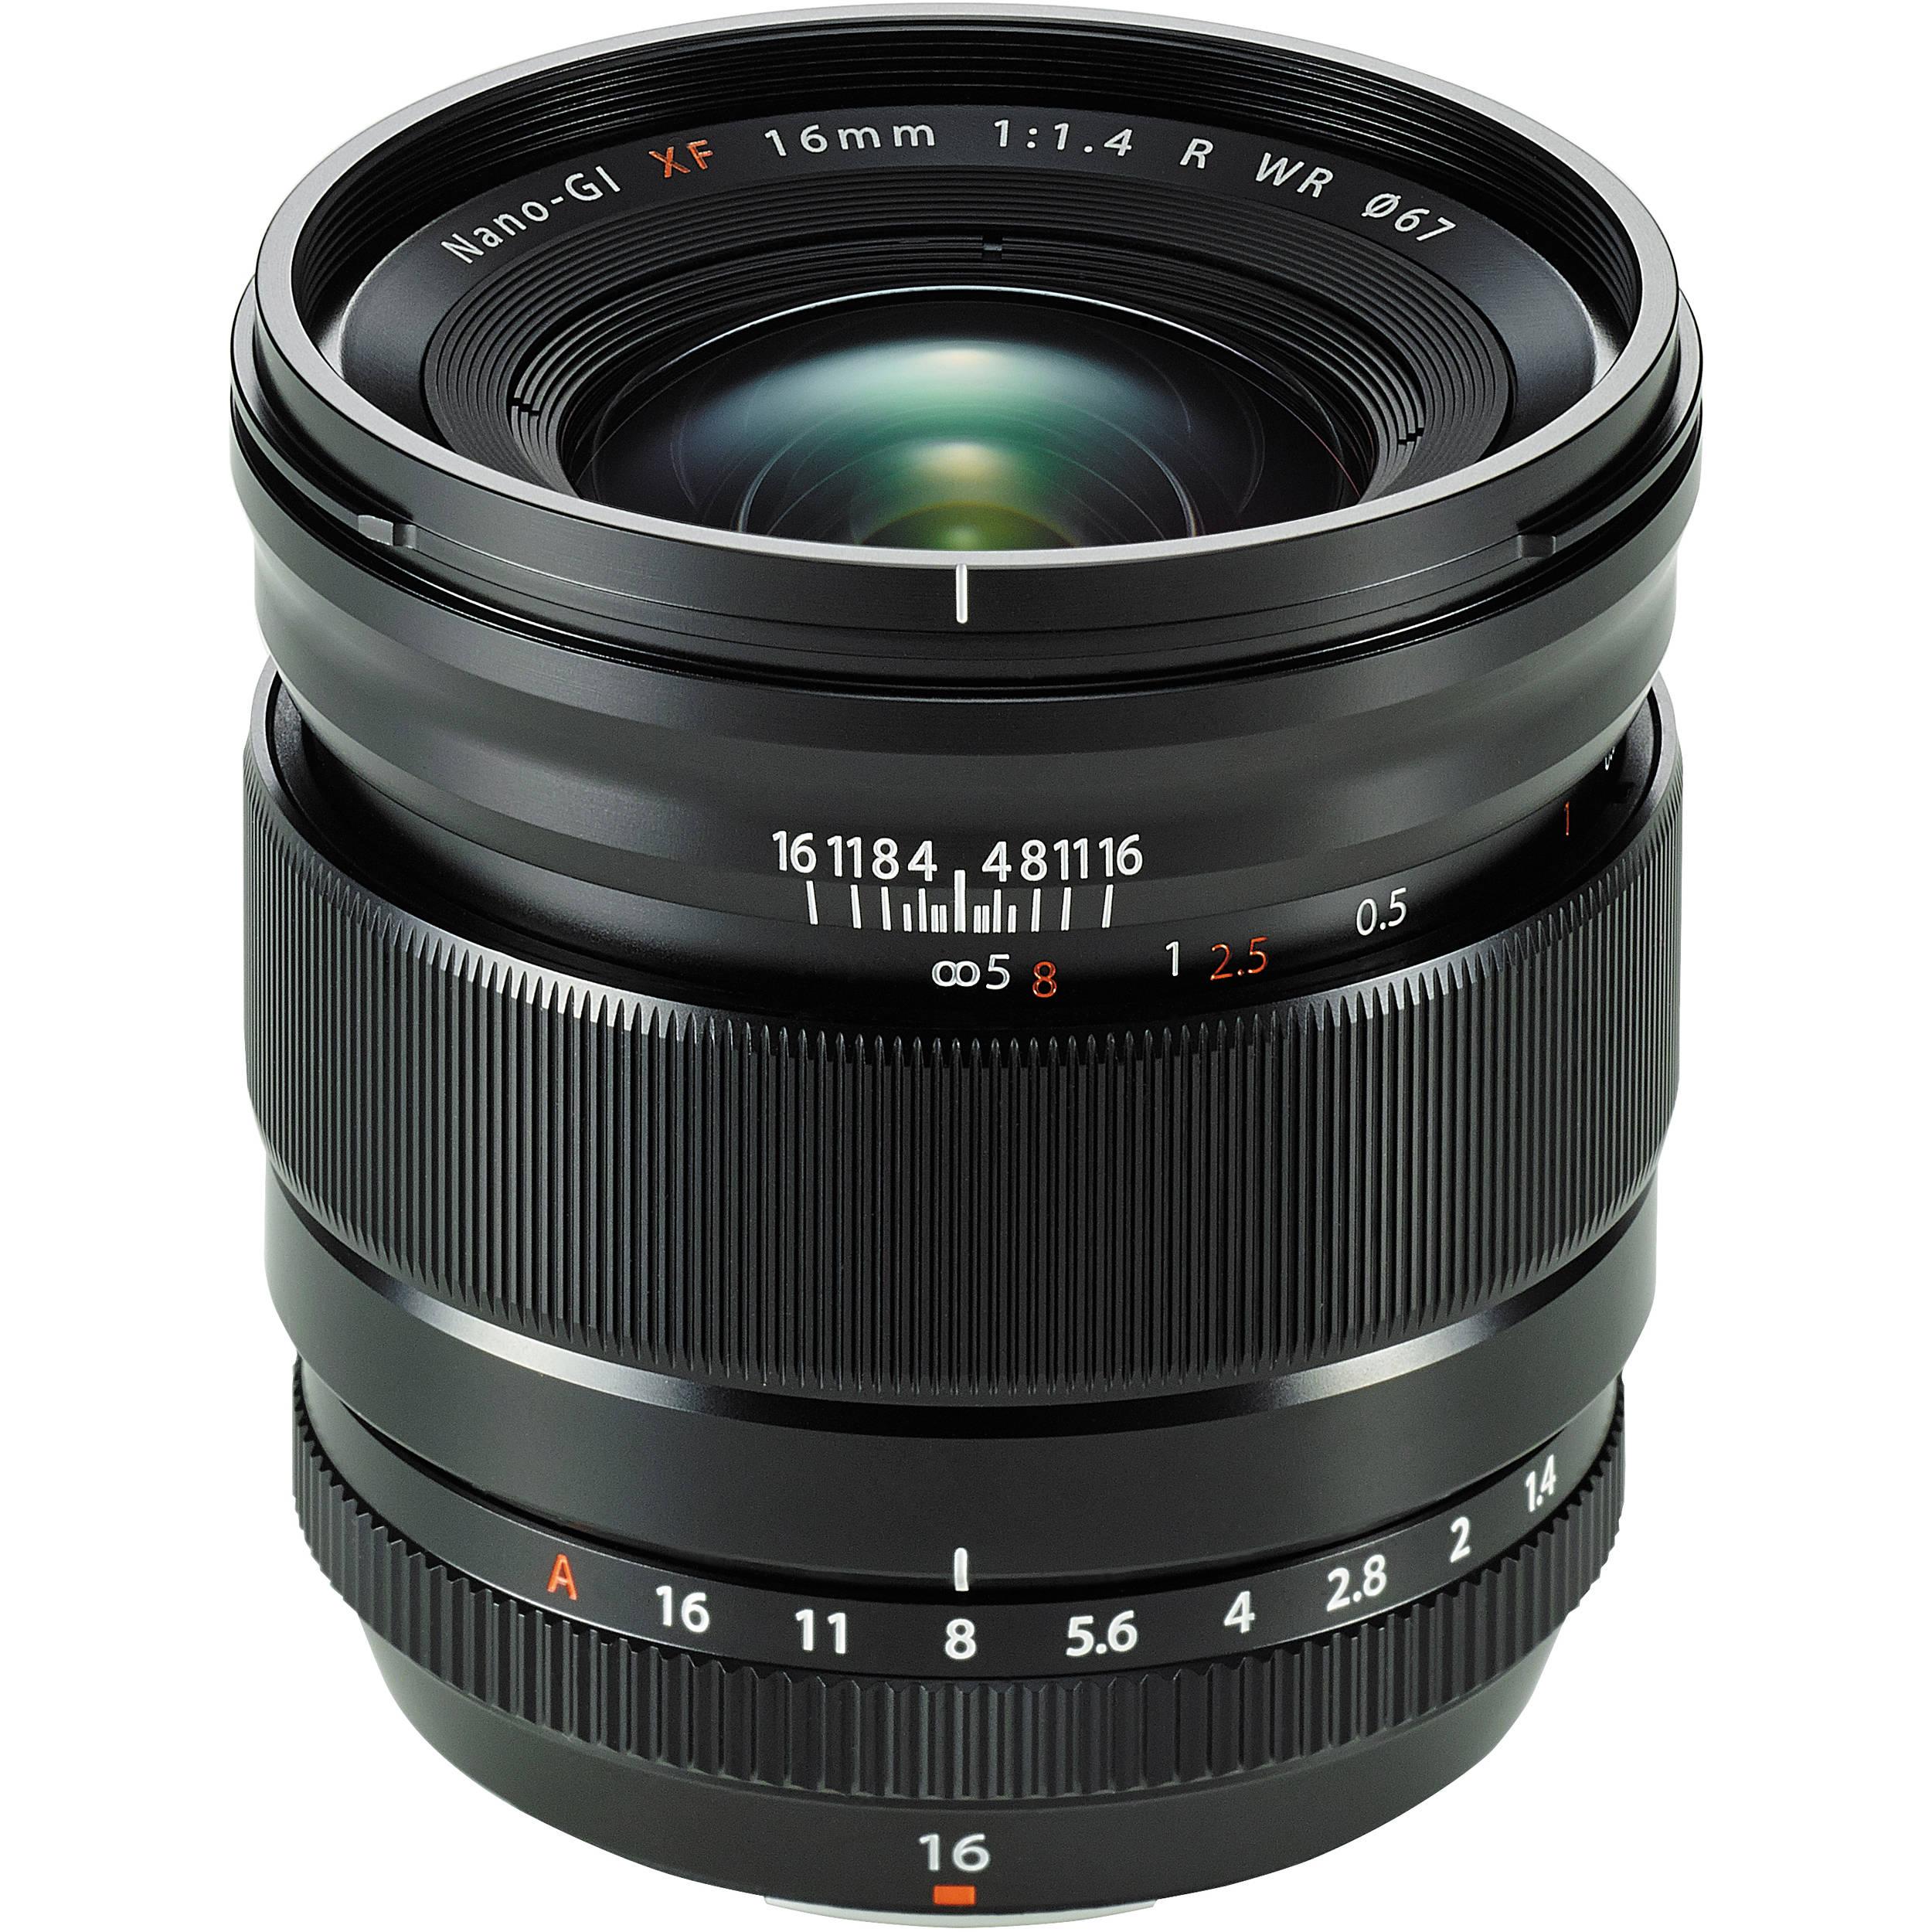 Fujifilm Fujinon XF 16mm F1.4 R WR (Amazon.co.uk Prime)